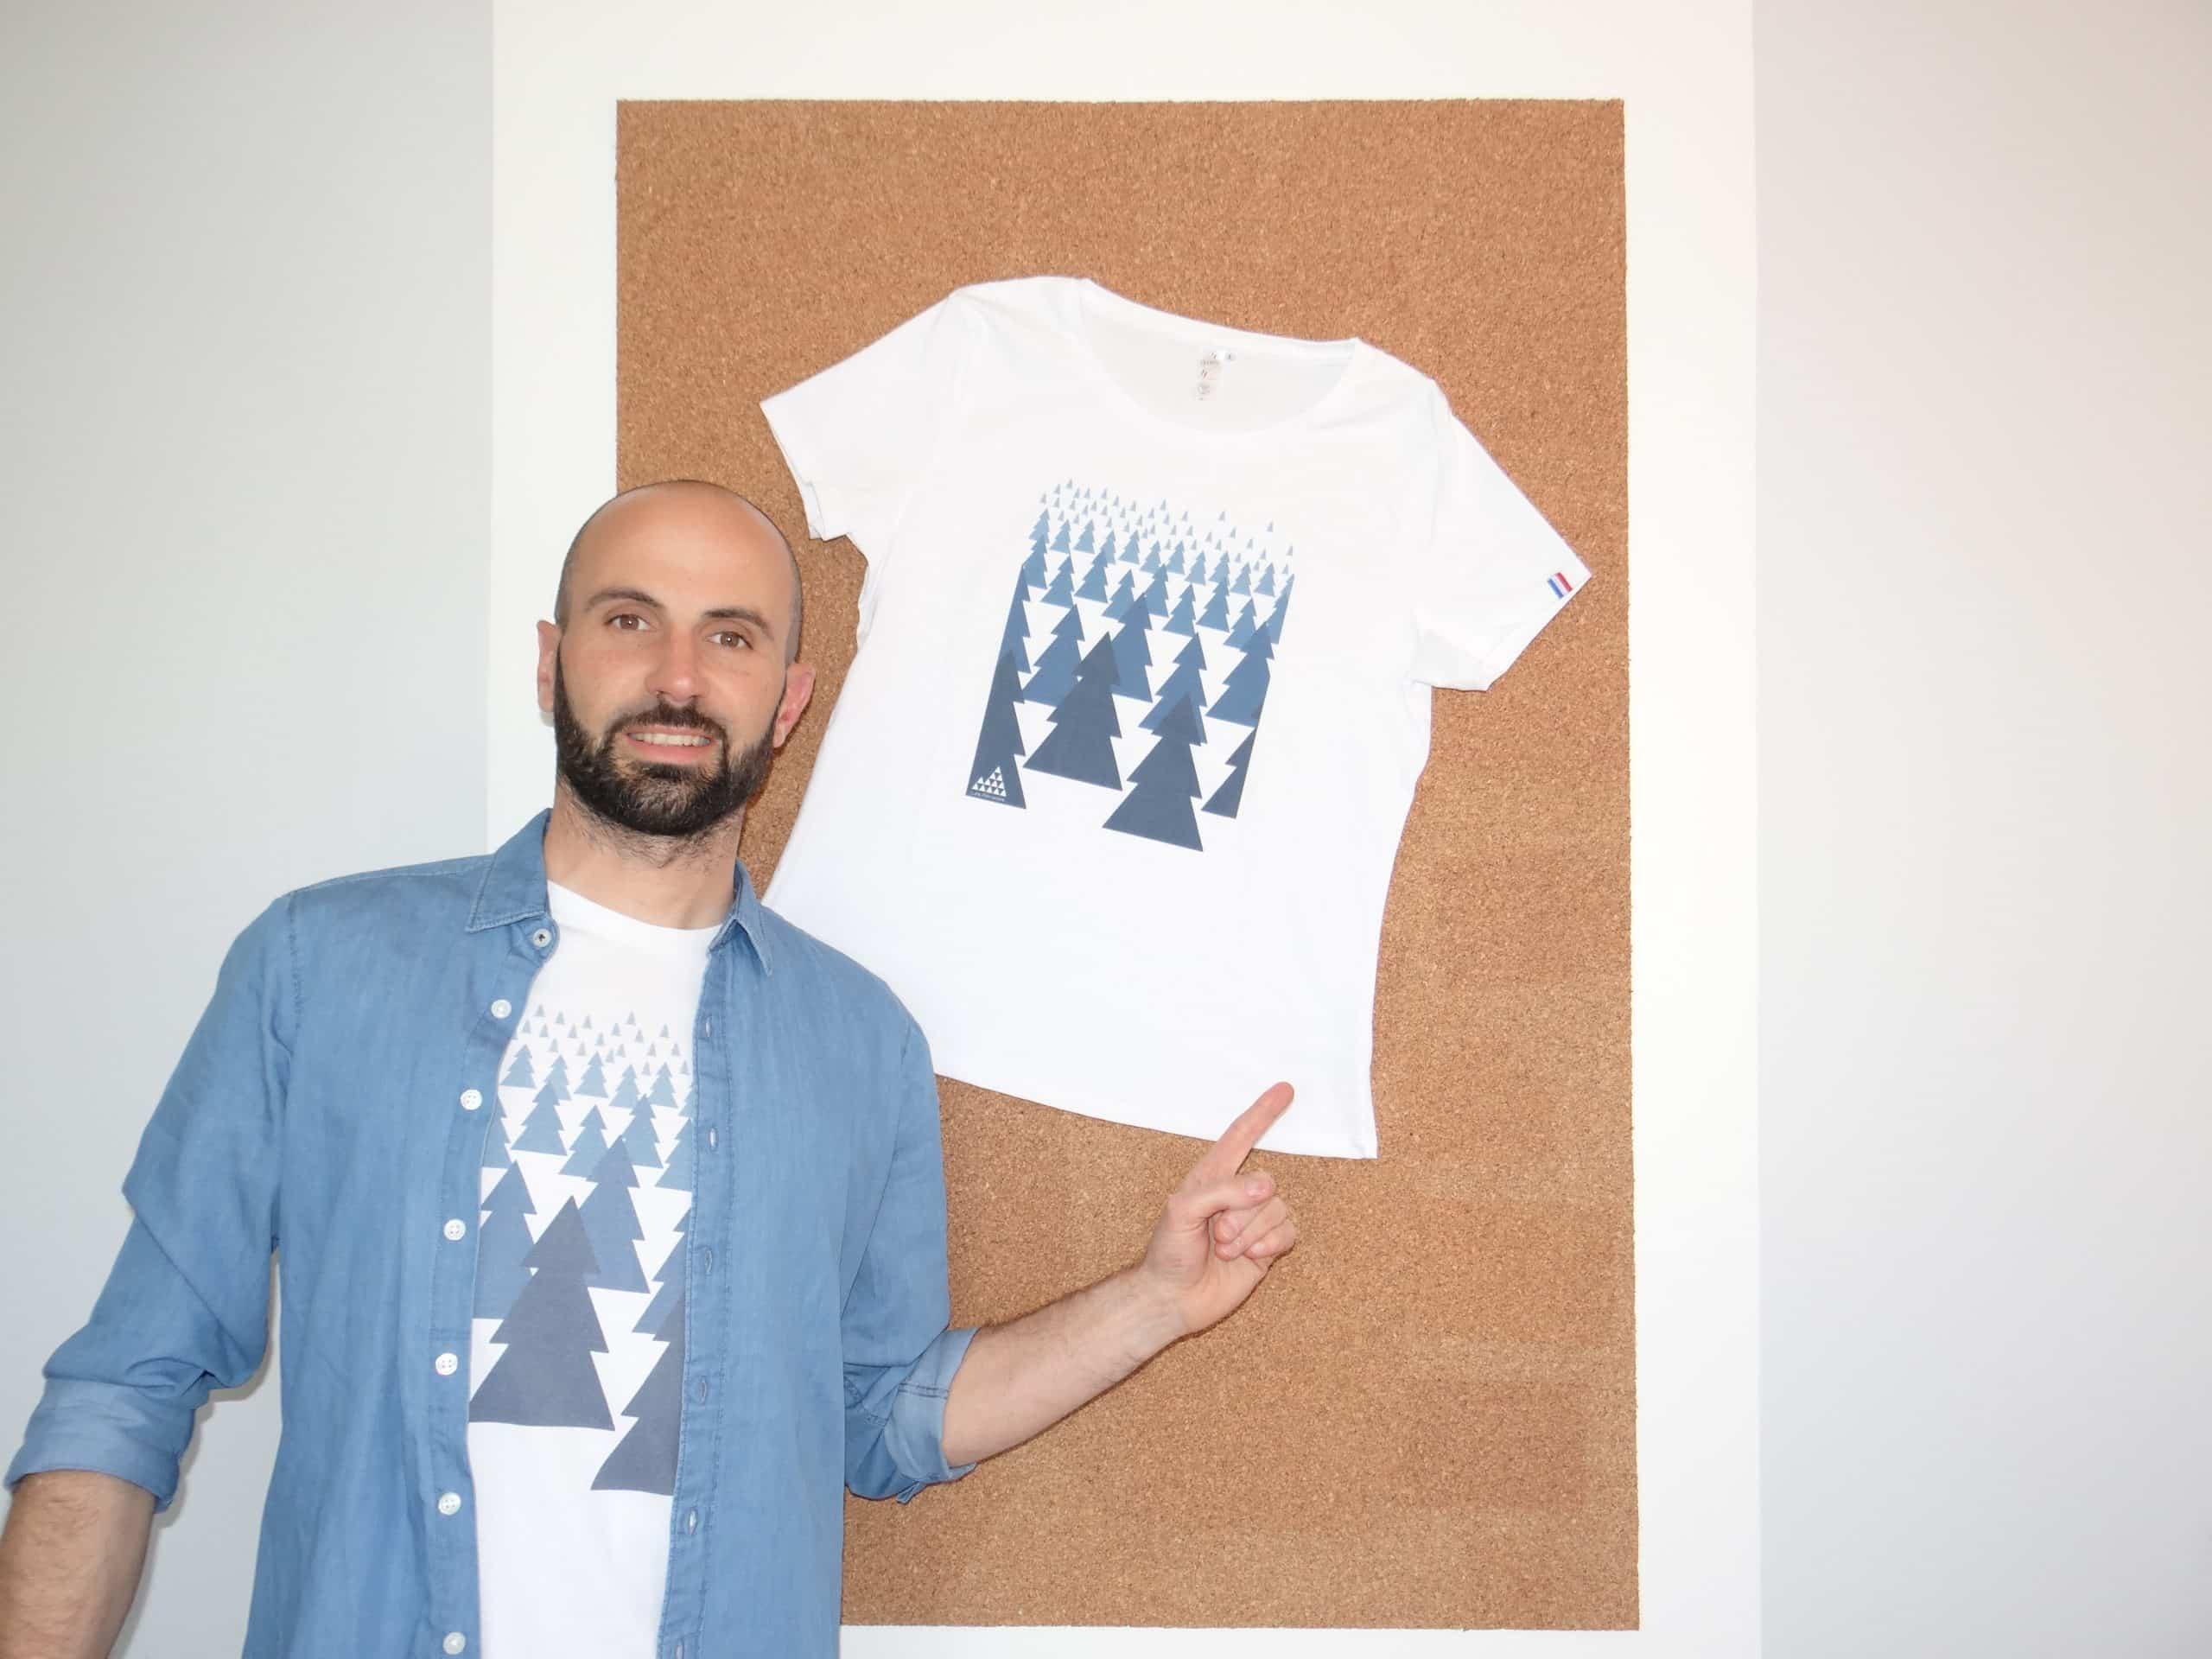 Yoann Corbière et son tee-shirt en coton biologique. ©LesPériades